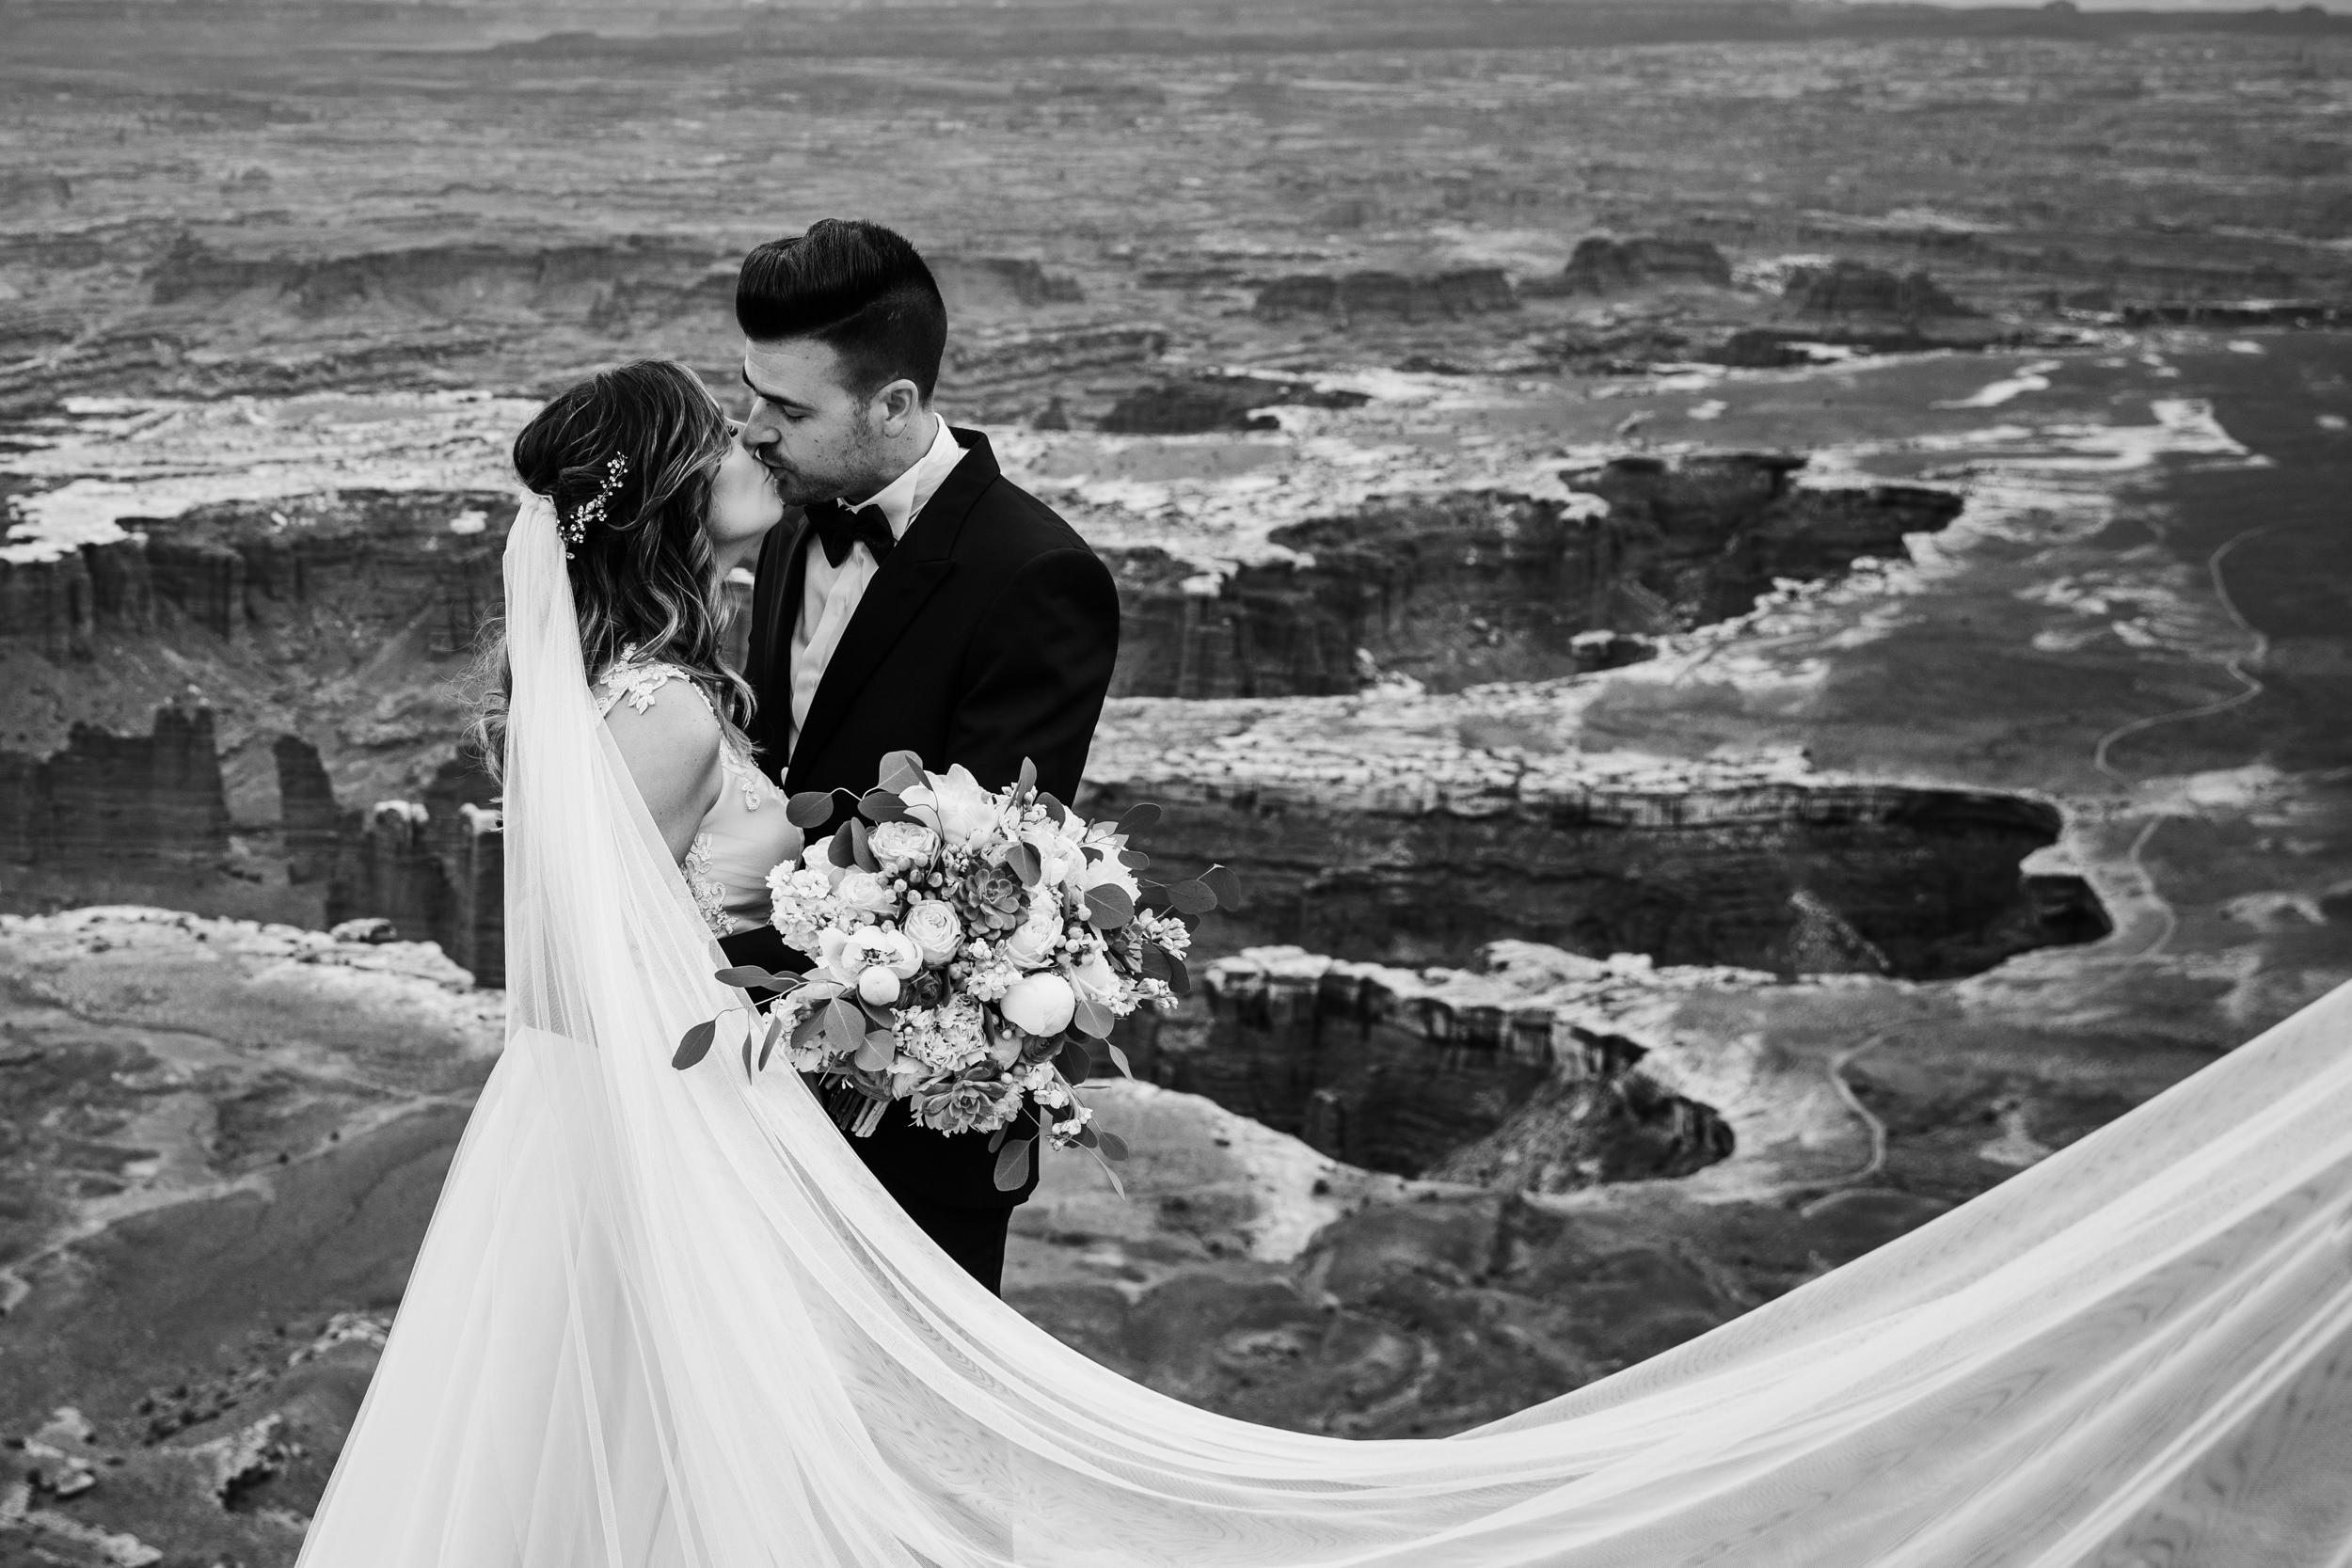 Hearnes-Elopement-Photography-Canyonlands-National-Park-Moab-Wedding-6.jpg